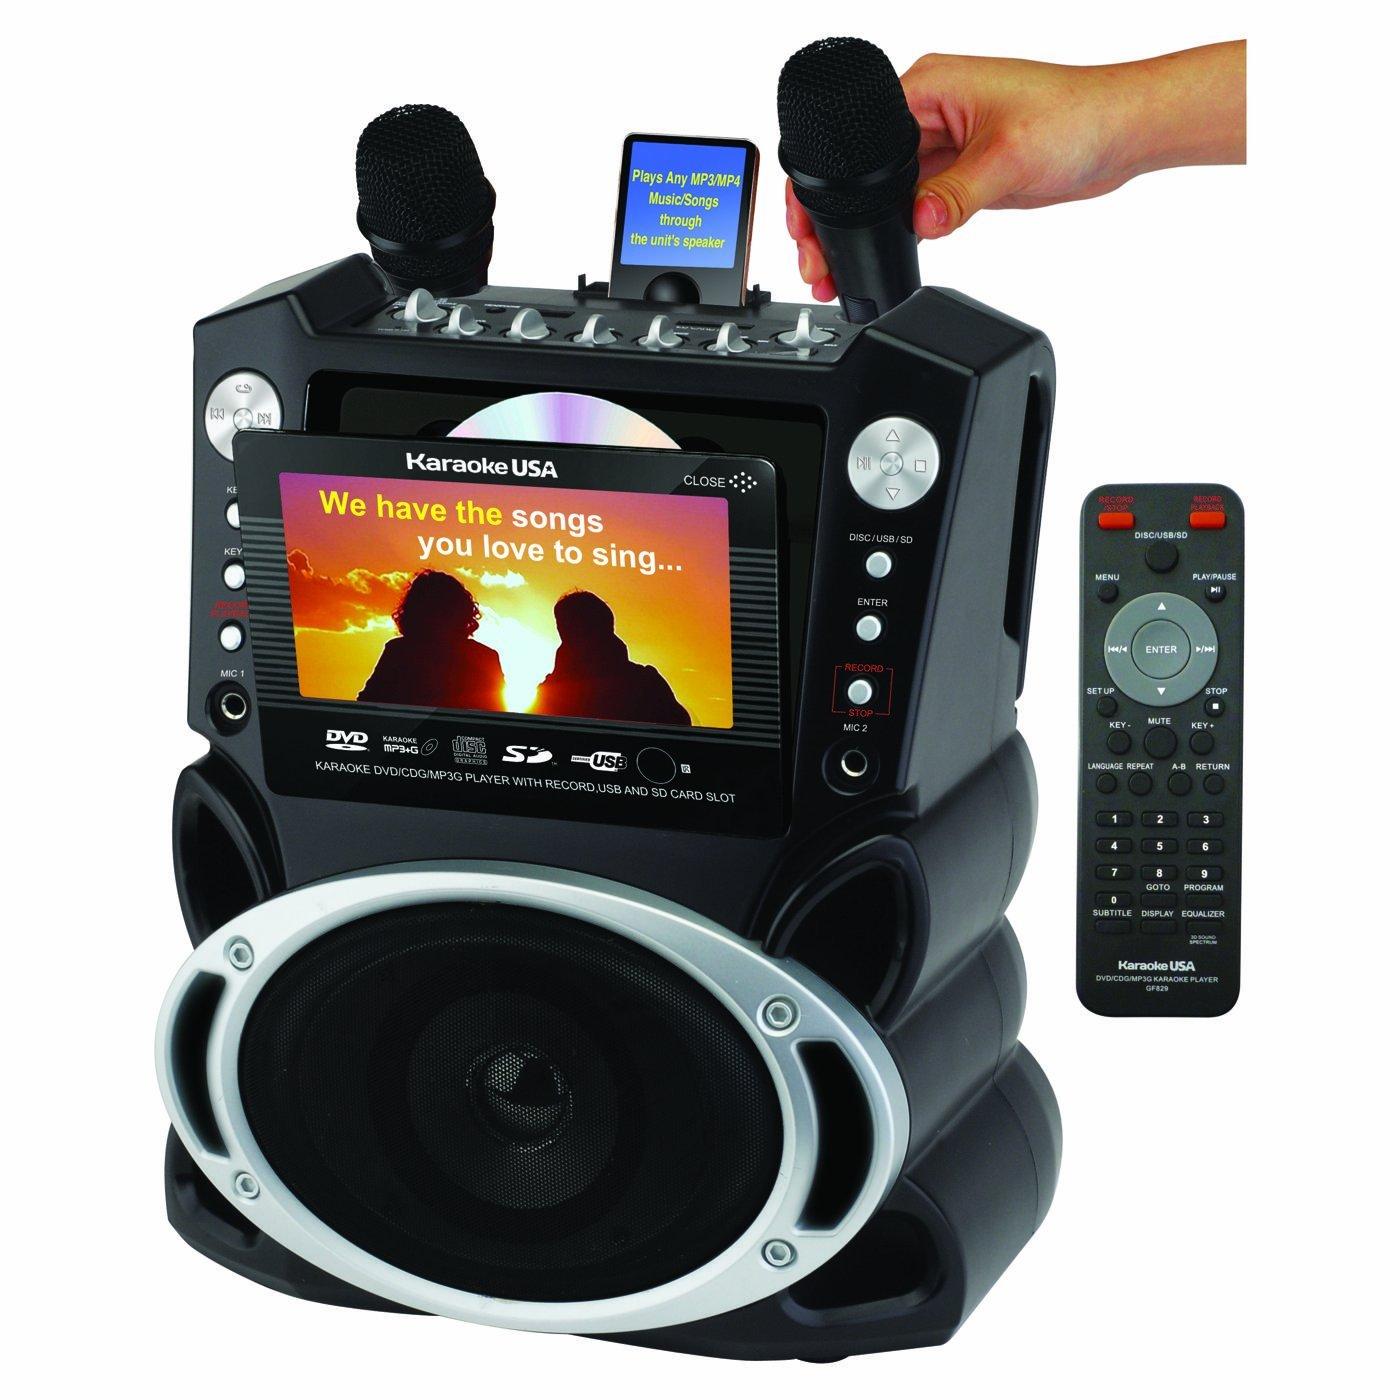 karaoke usa gf829 karaoke system